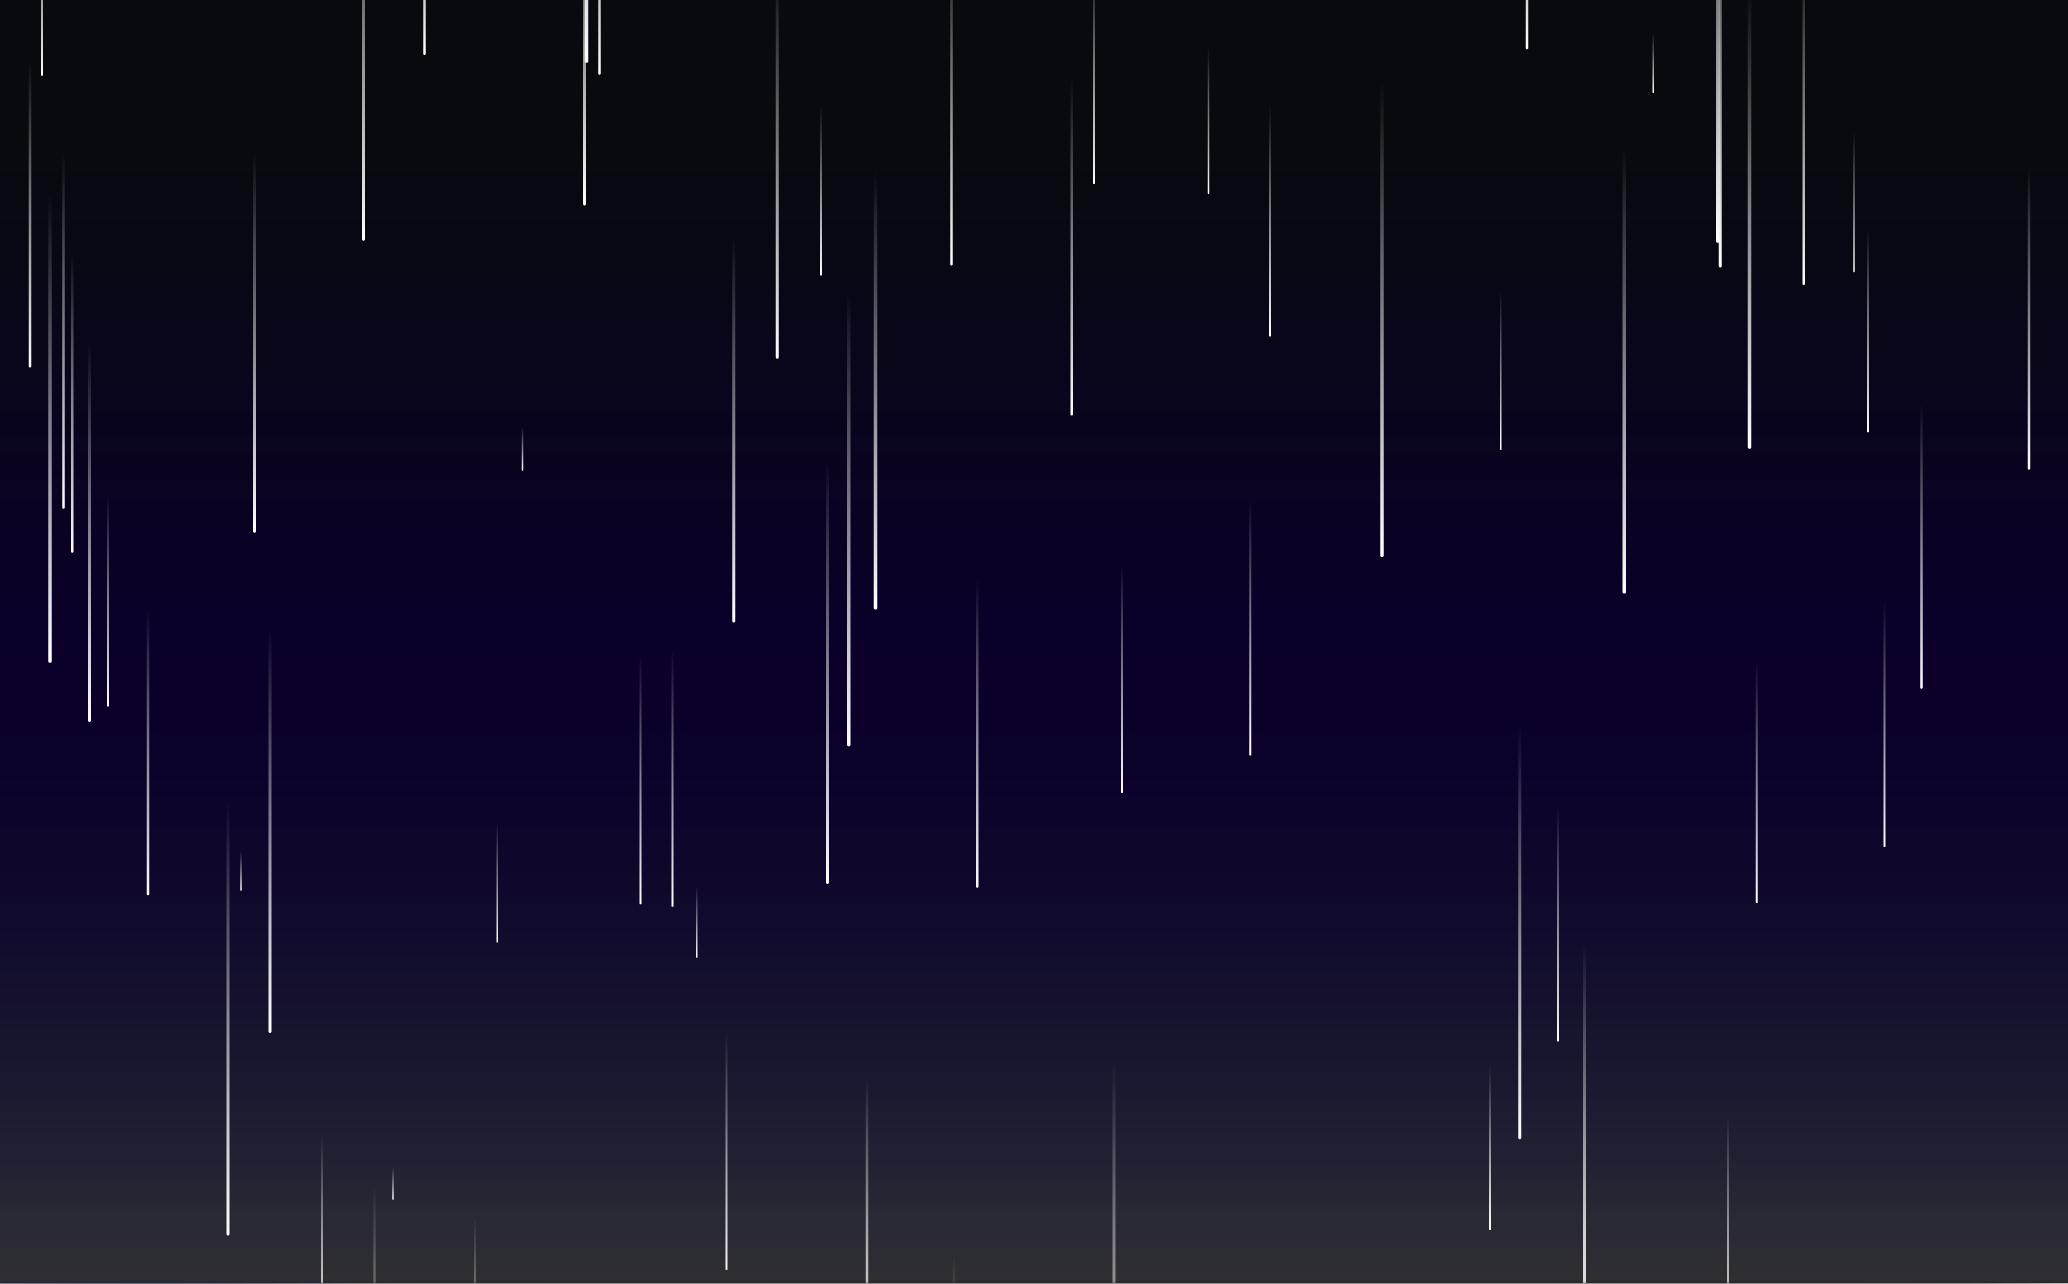 screenshot of Rafael Rozendaal's net art  looking at something  from  http://www.lookingatsomething.com